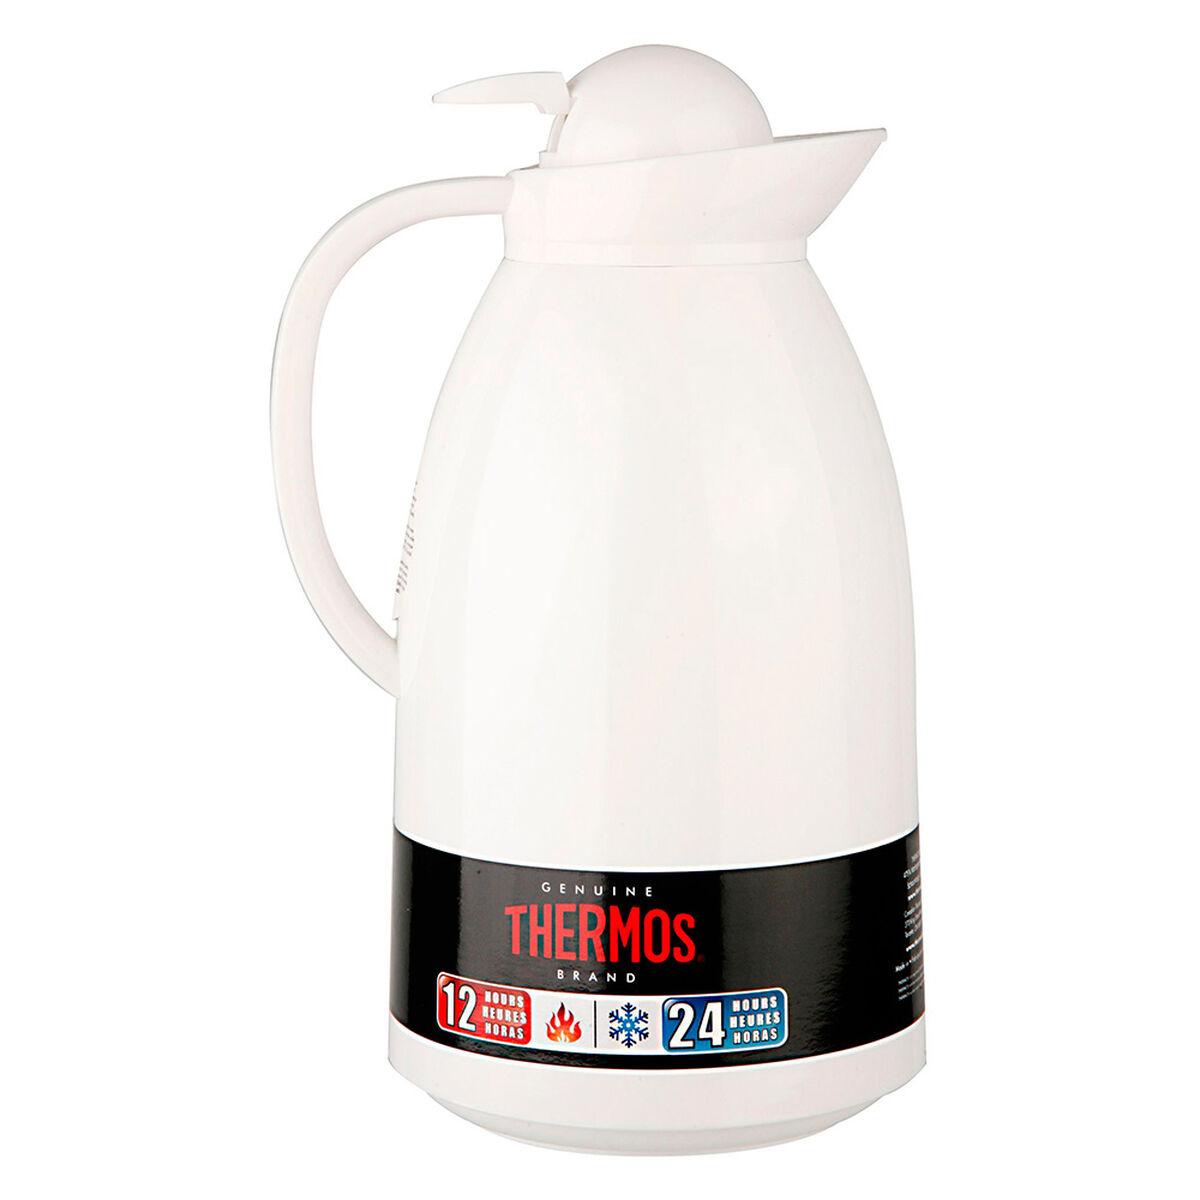 Thermo Plástico/Vidrio 1,5 Lt